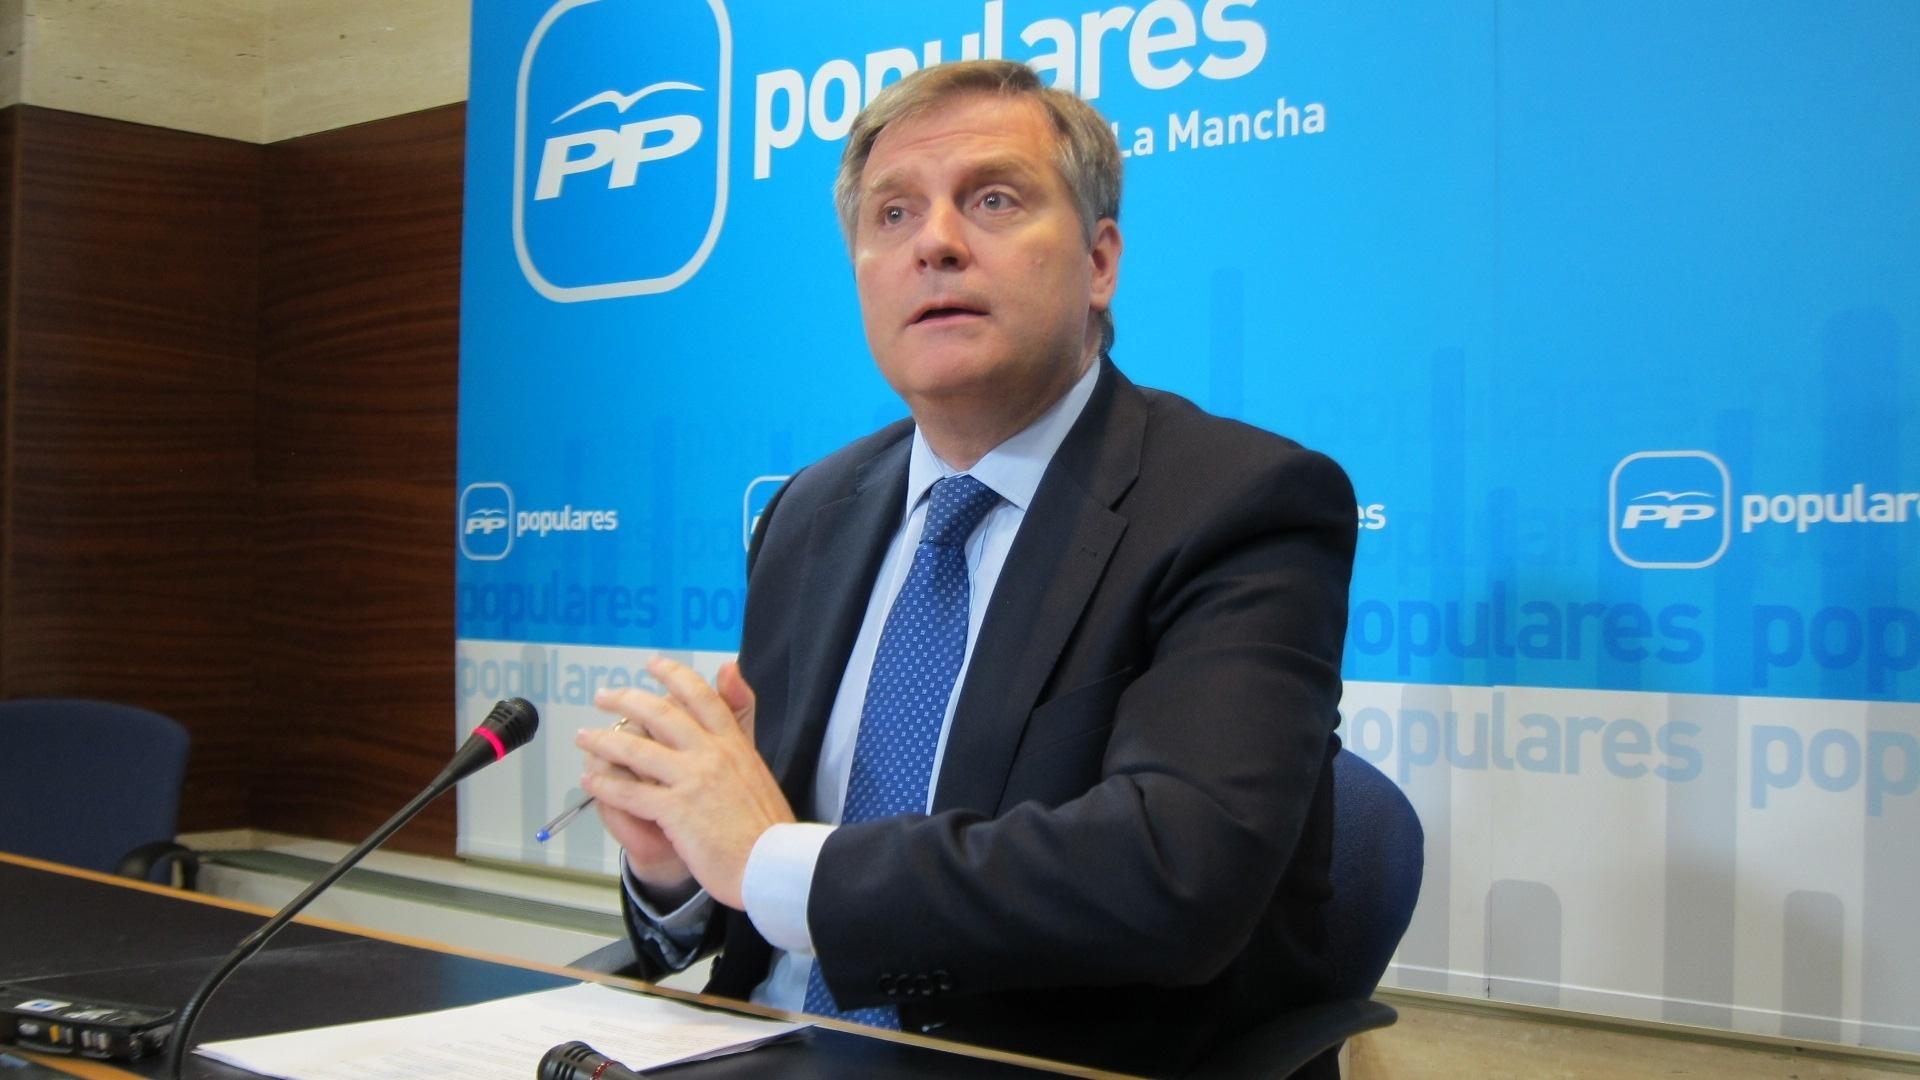 PP C-LM defiende que este miércoles se constató el «éxito» de Cospedal en materia hidráulica